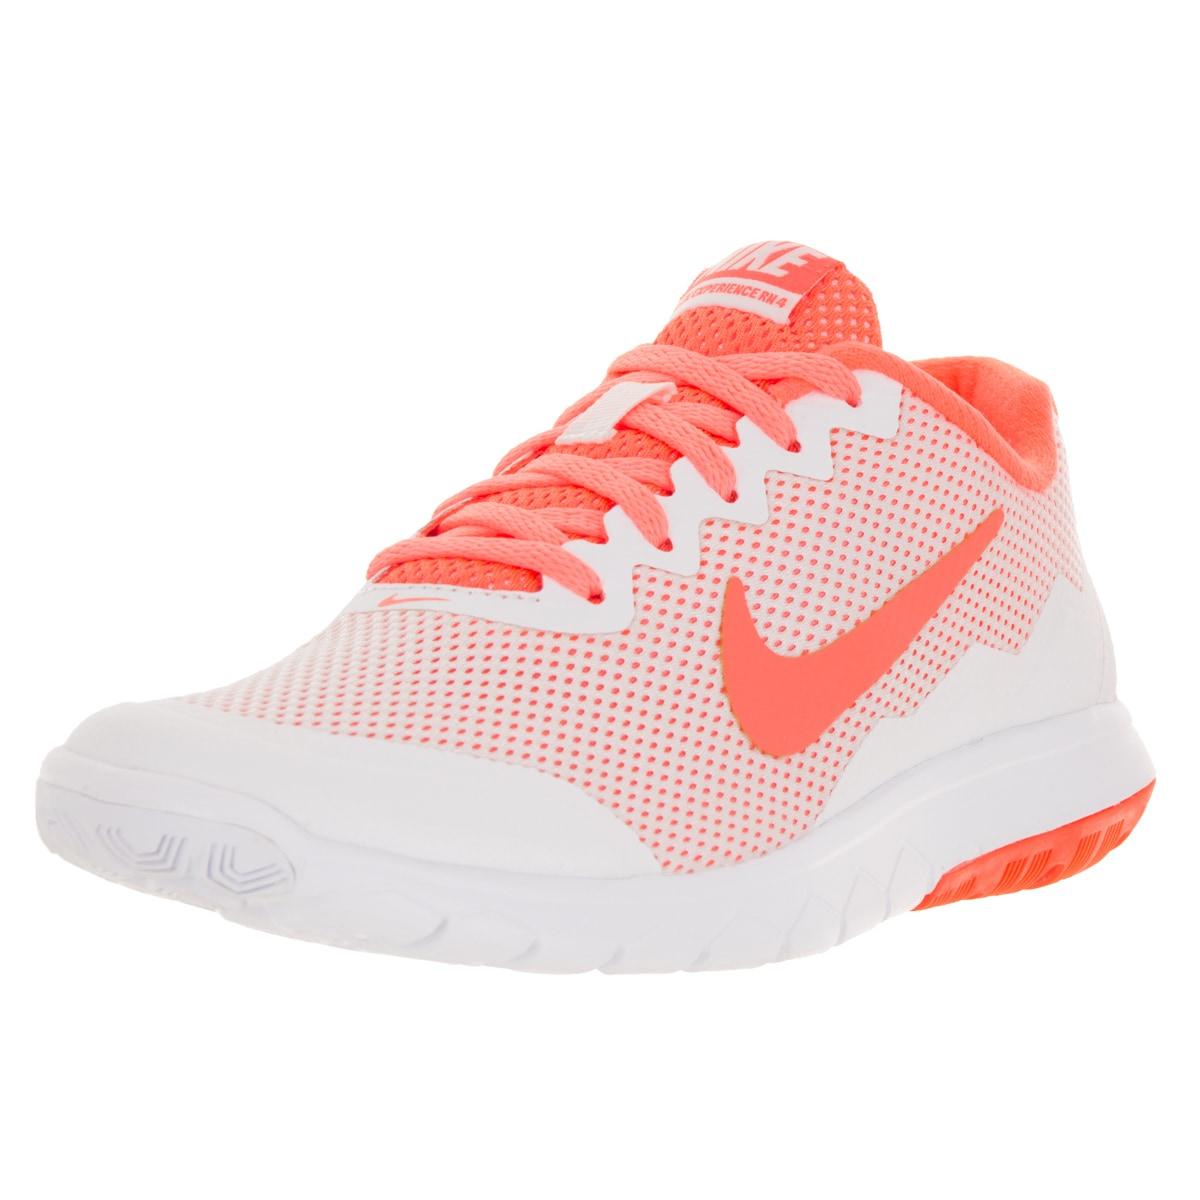 Nike Women's Flex Experience Rn 4 WhiteBright Mango Running Shoes